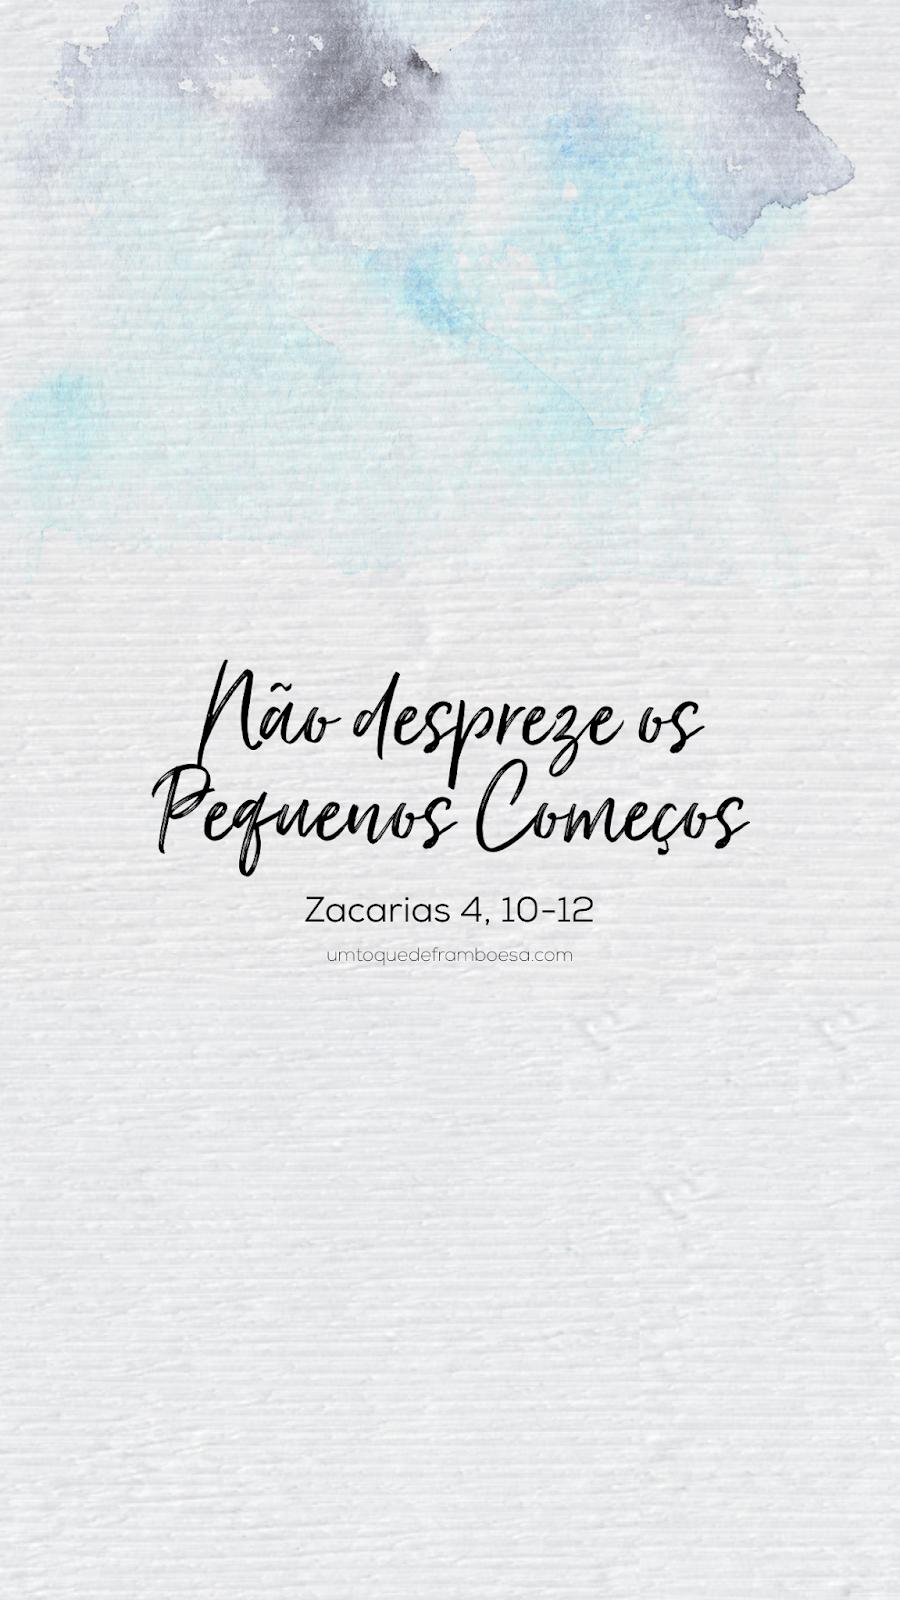 Versículo bíblico curto sobre fundo aquarelado